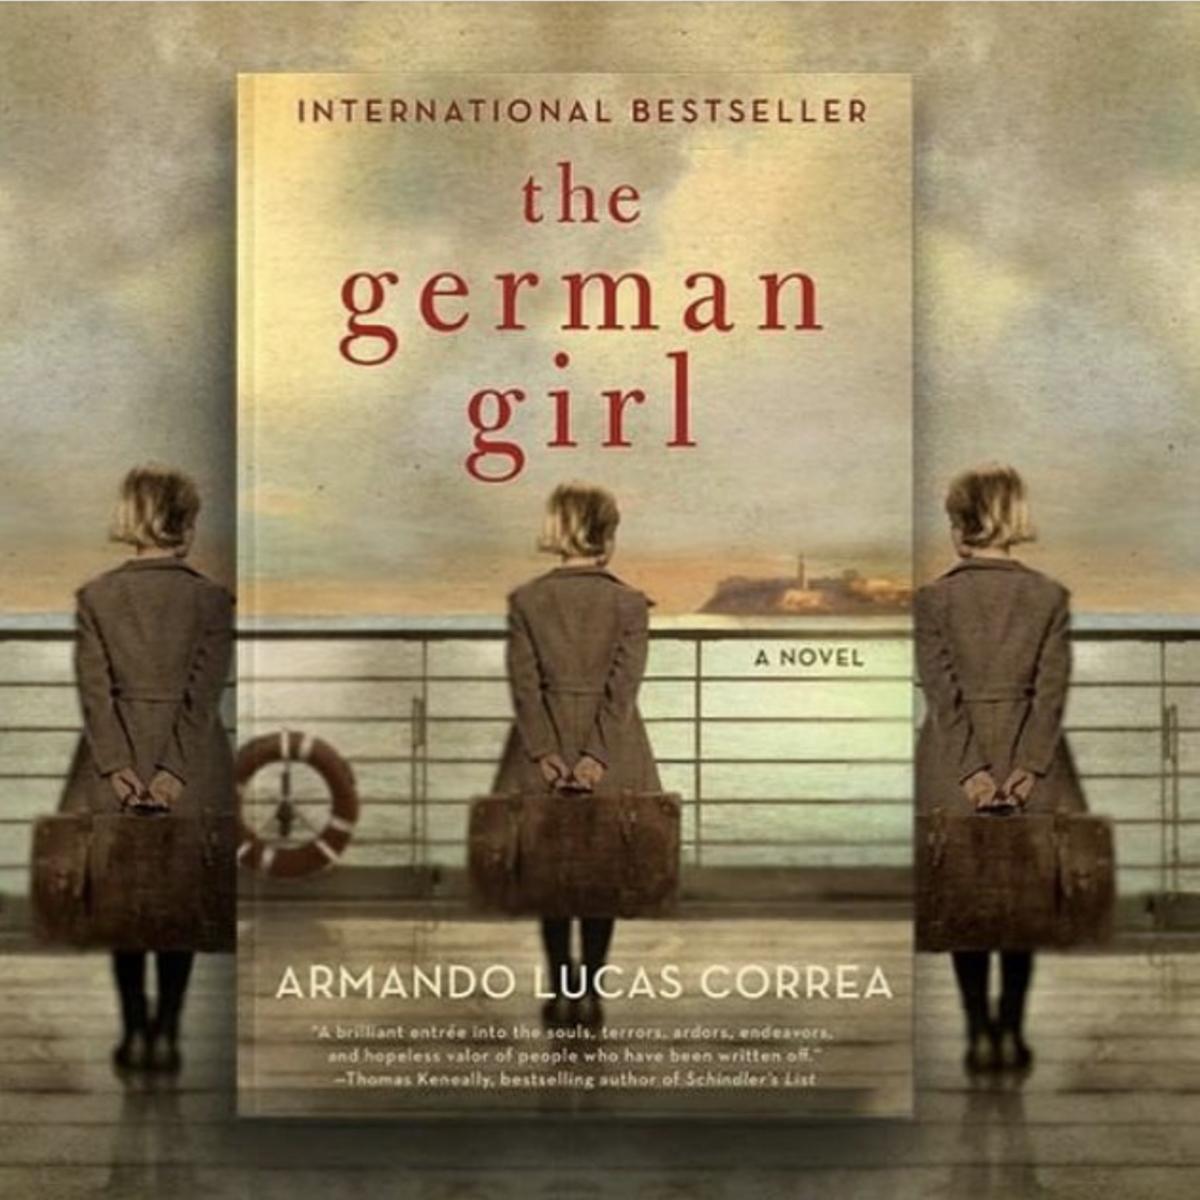 german girl.png